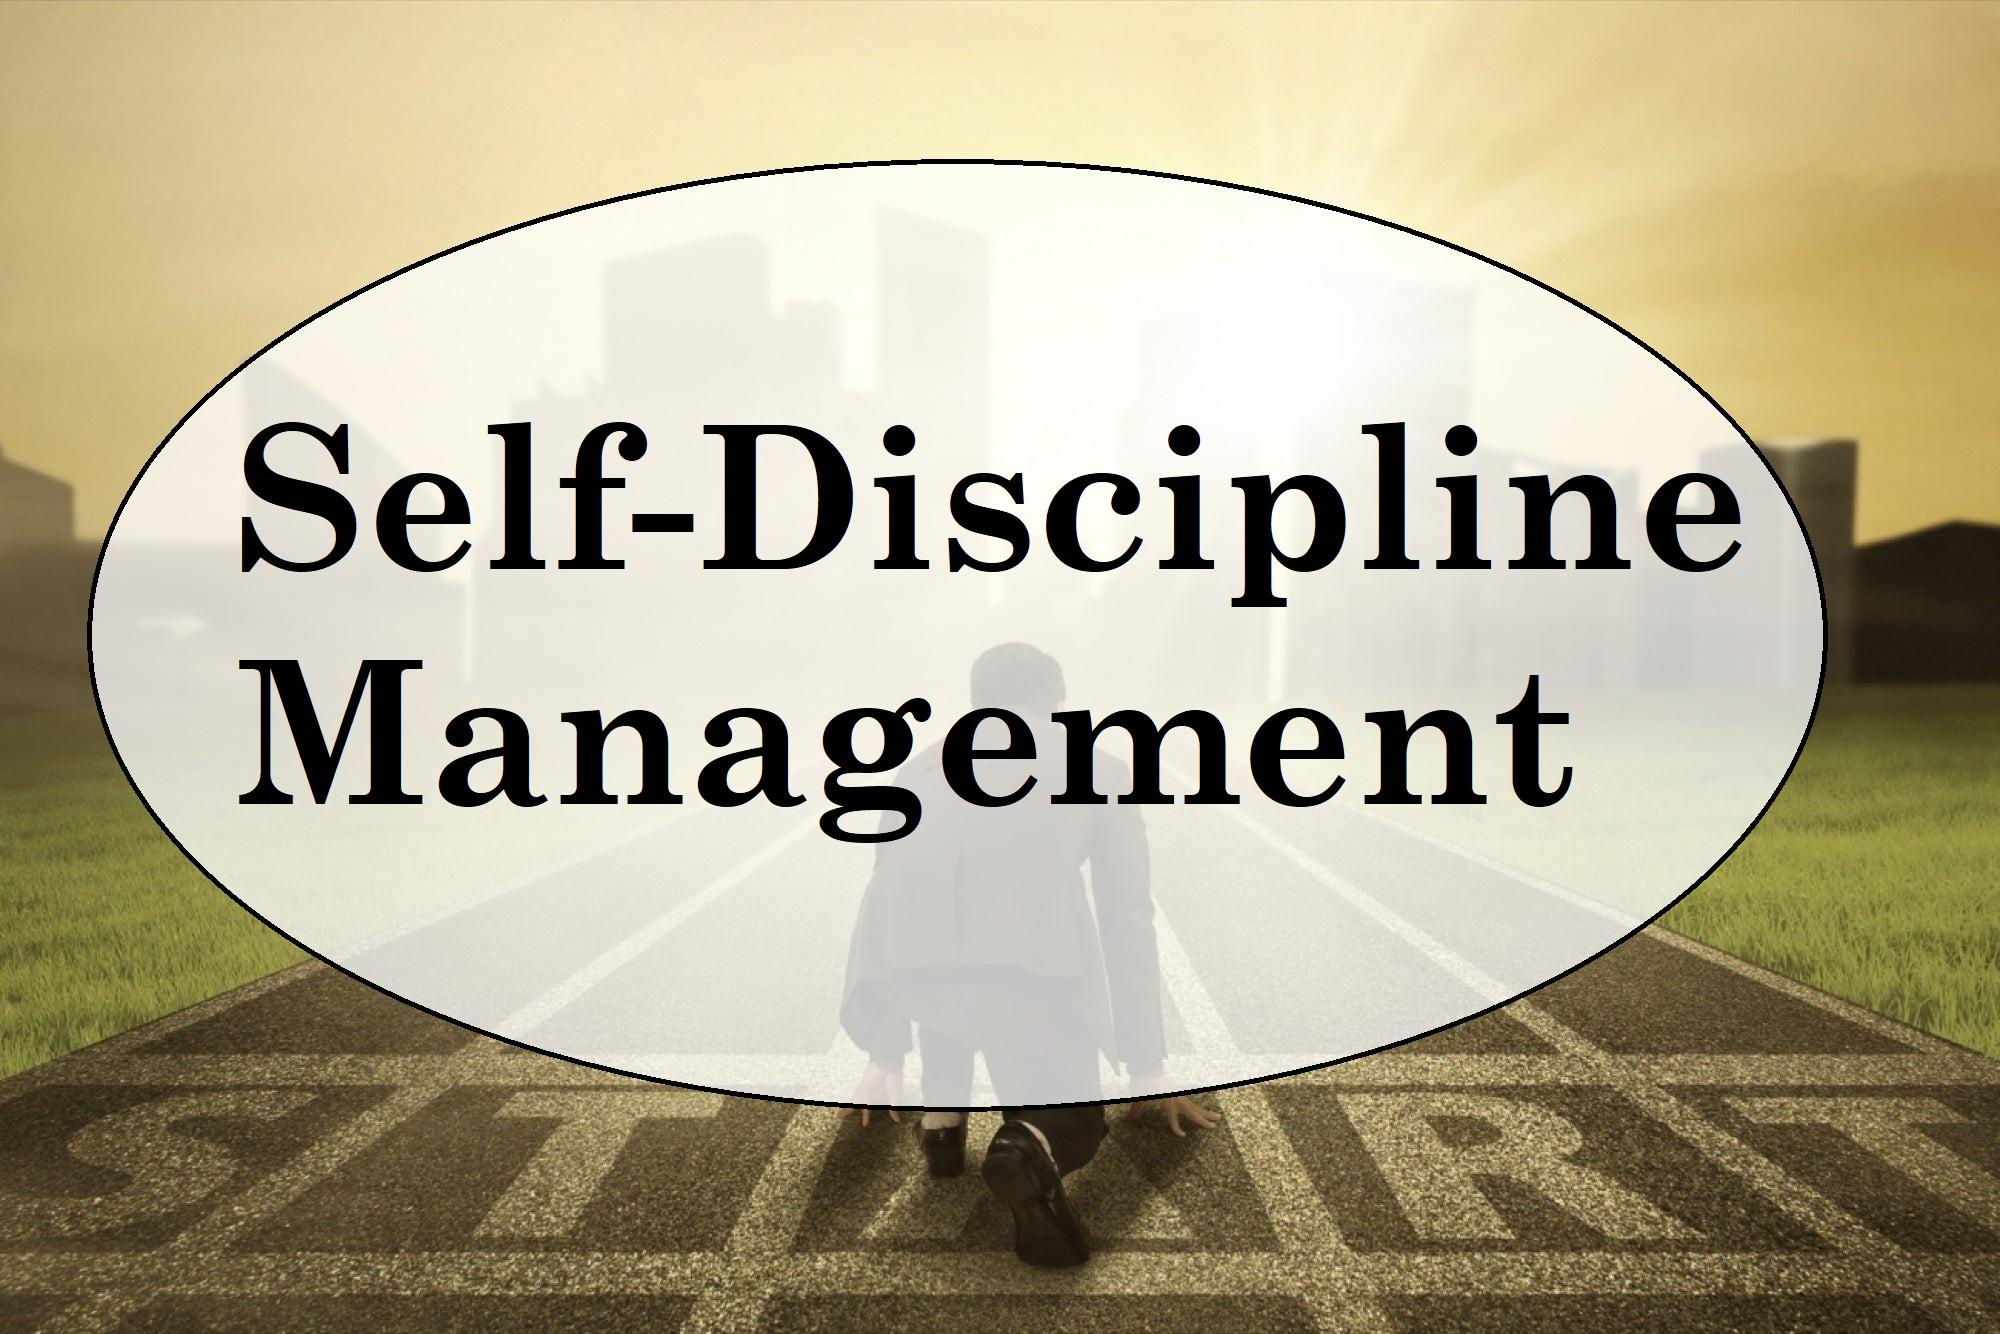 Self-Discipline Management